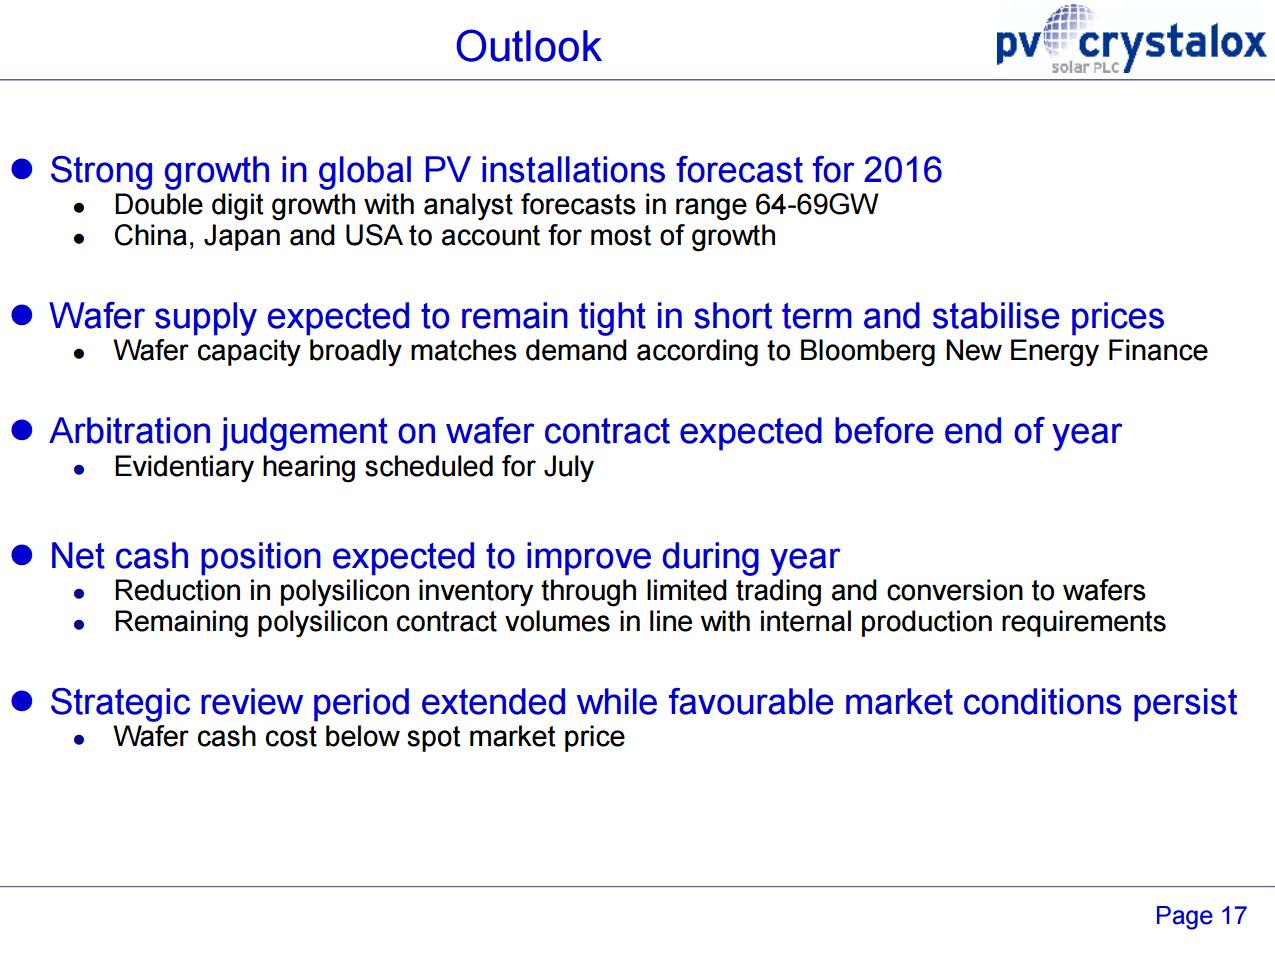 PV Crystalox outlook 2015